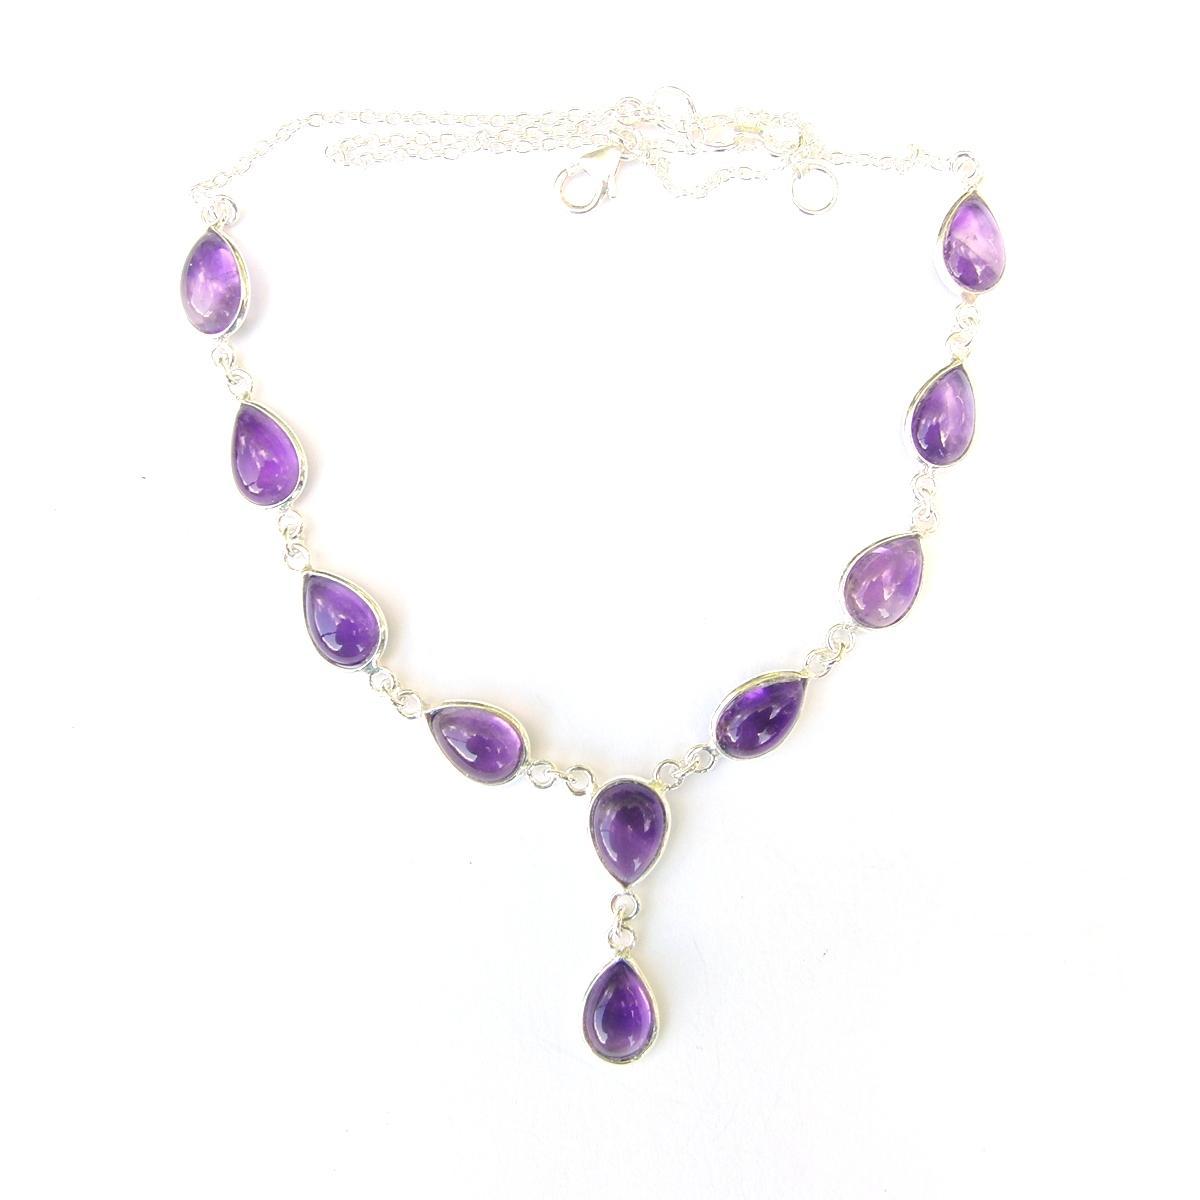 Amethyst Large Teardrop Necklace